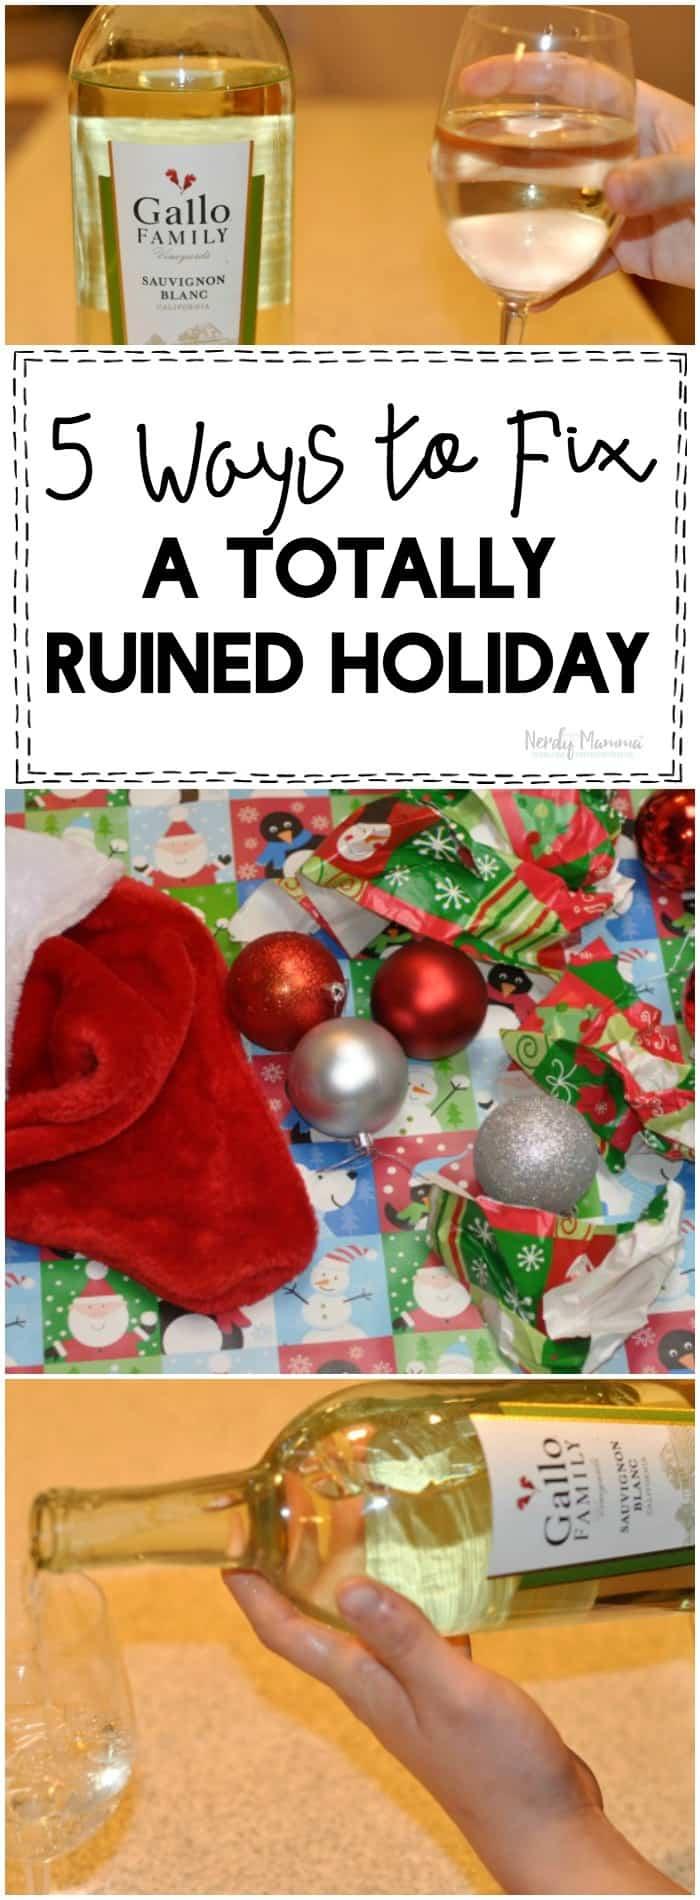 Wanna know how to fix a ruined holiday? Uhhhhh wine. Duh!